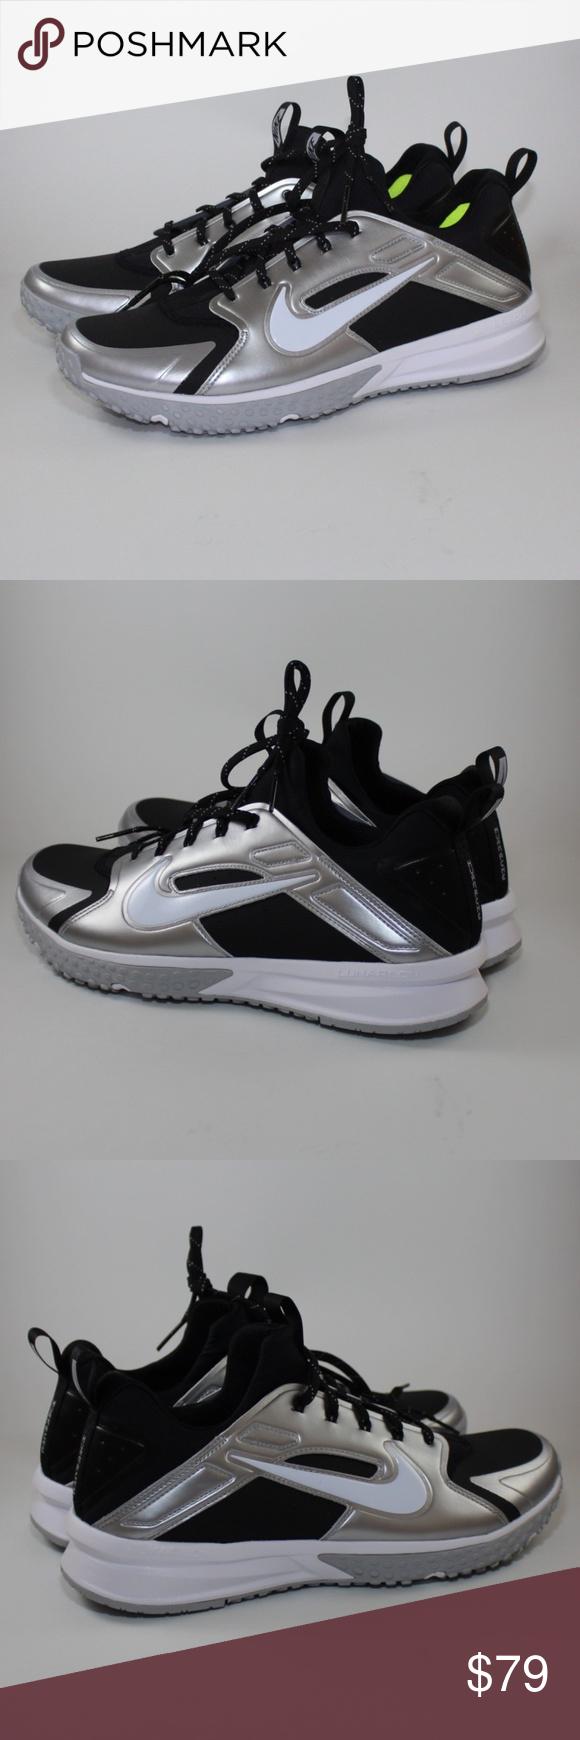 4c5269b5b3b2c Nike Air Huarache Turf Baseball Trainer Shoes Hello and Thank you for  Shopping here!